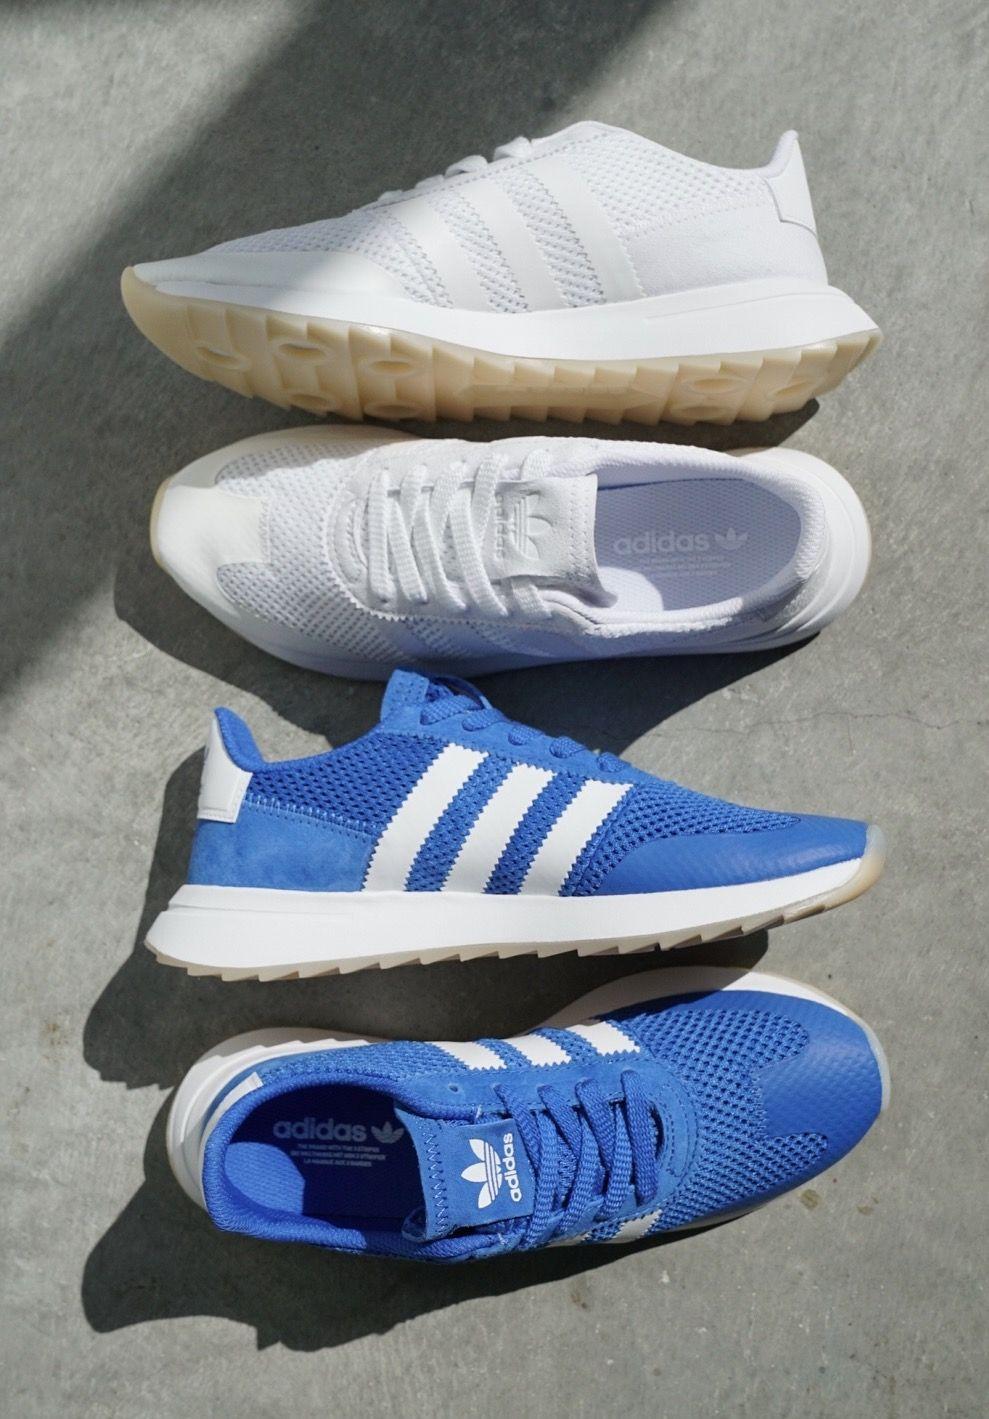 Adidas skate shoes zumiez - Adidas Flashback Blue White Womens Shoes